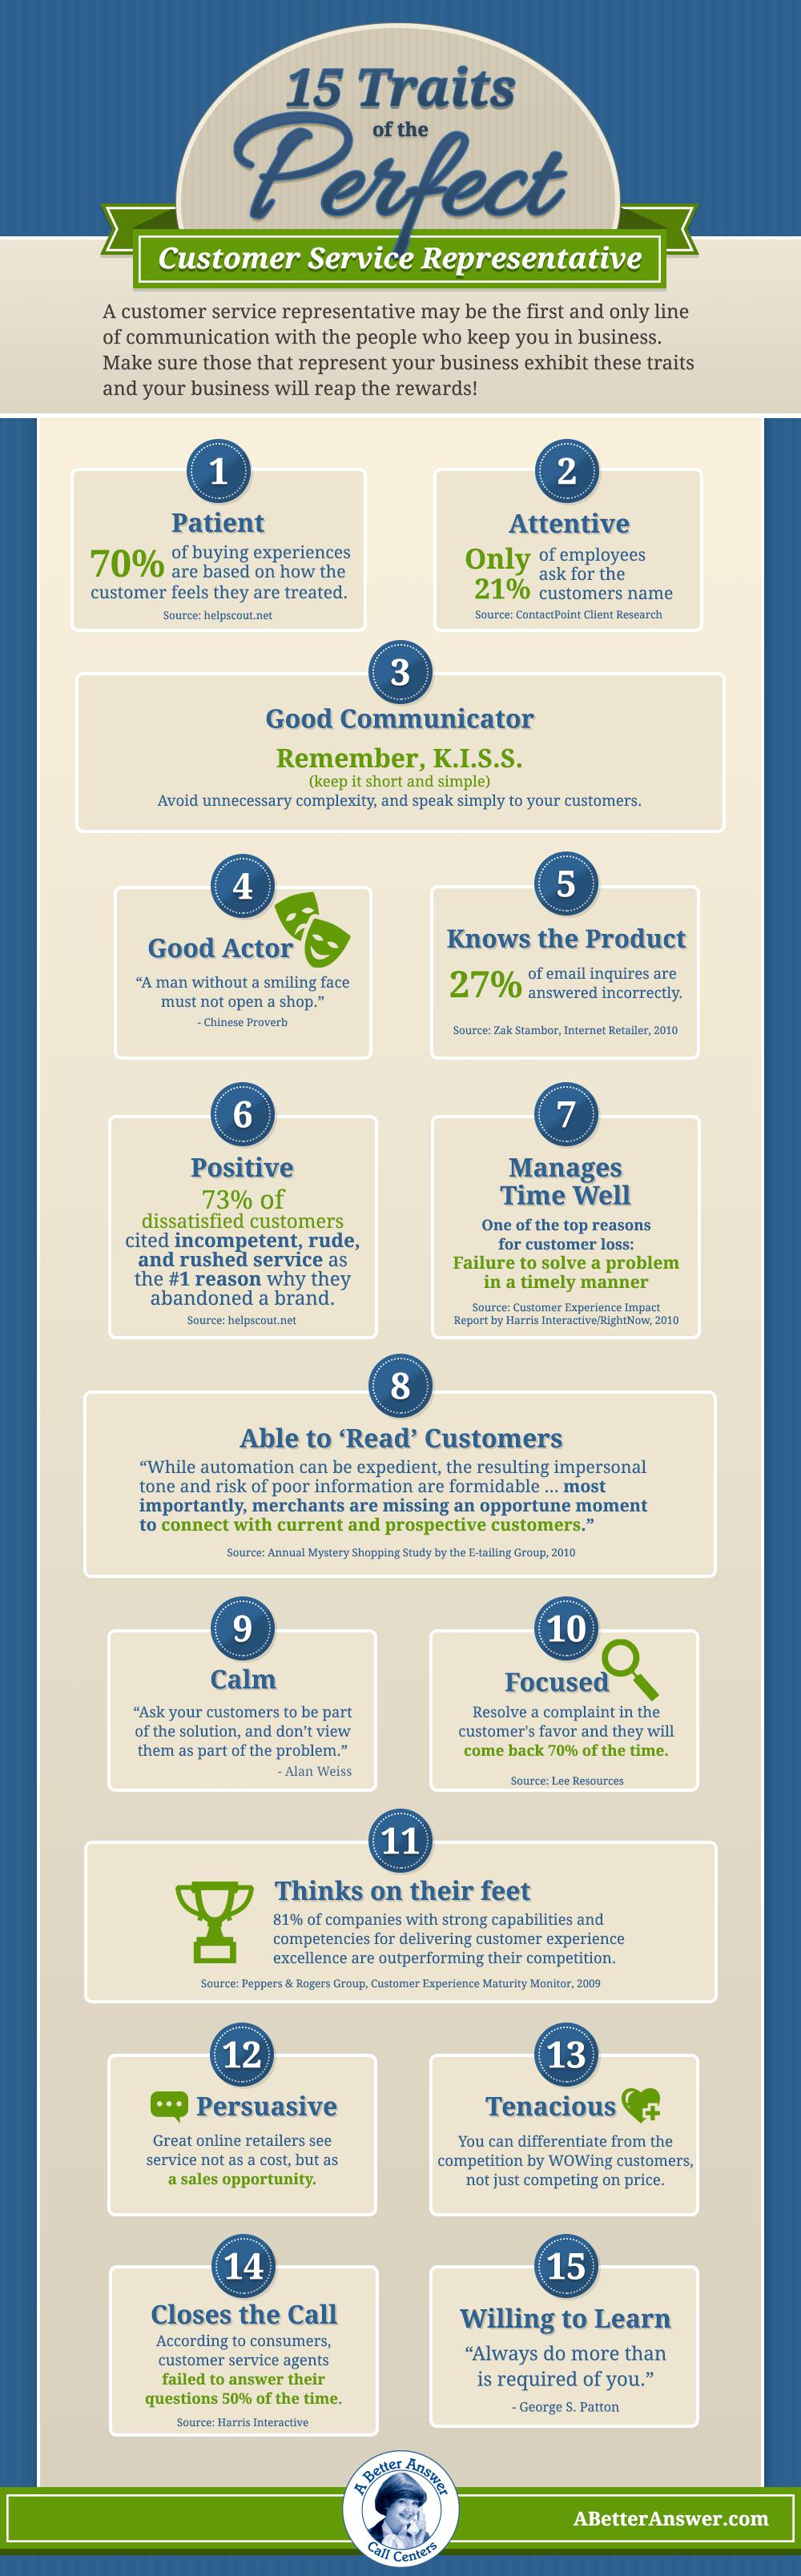 15 Traits of the Perfect Customer Service Representative